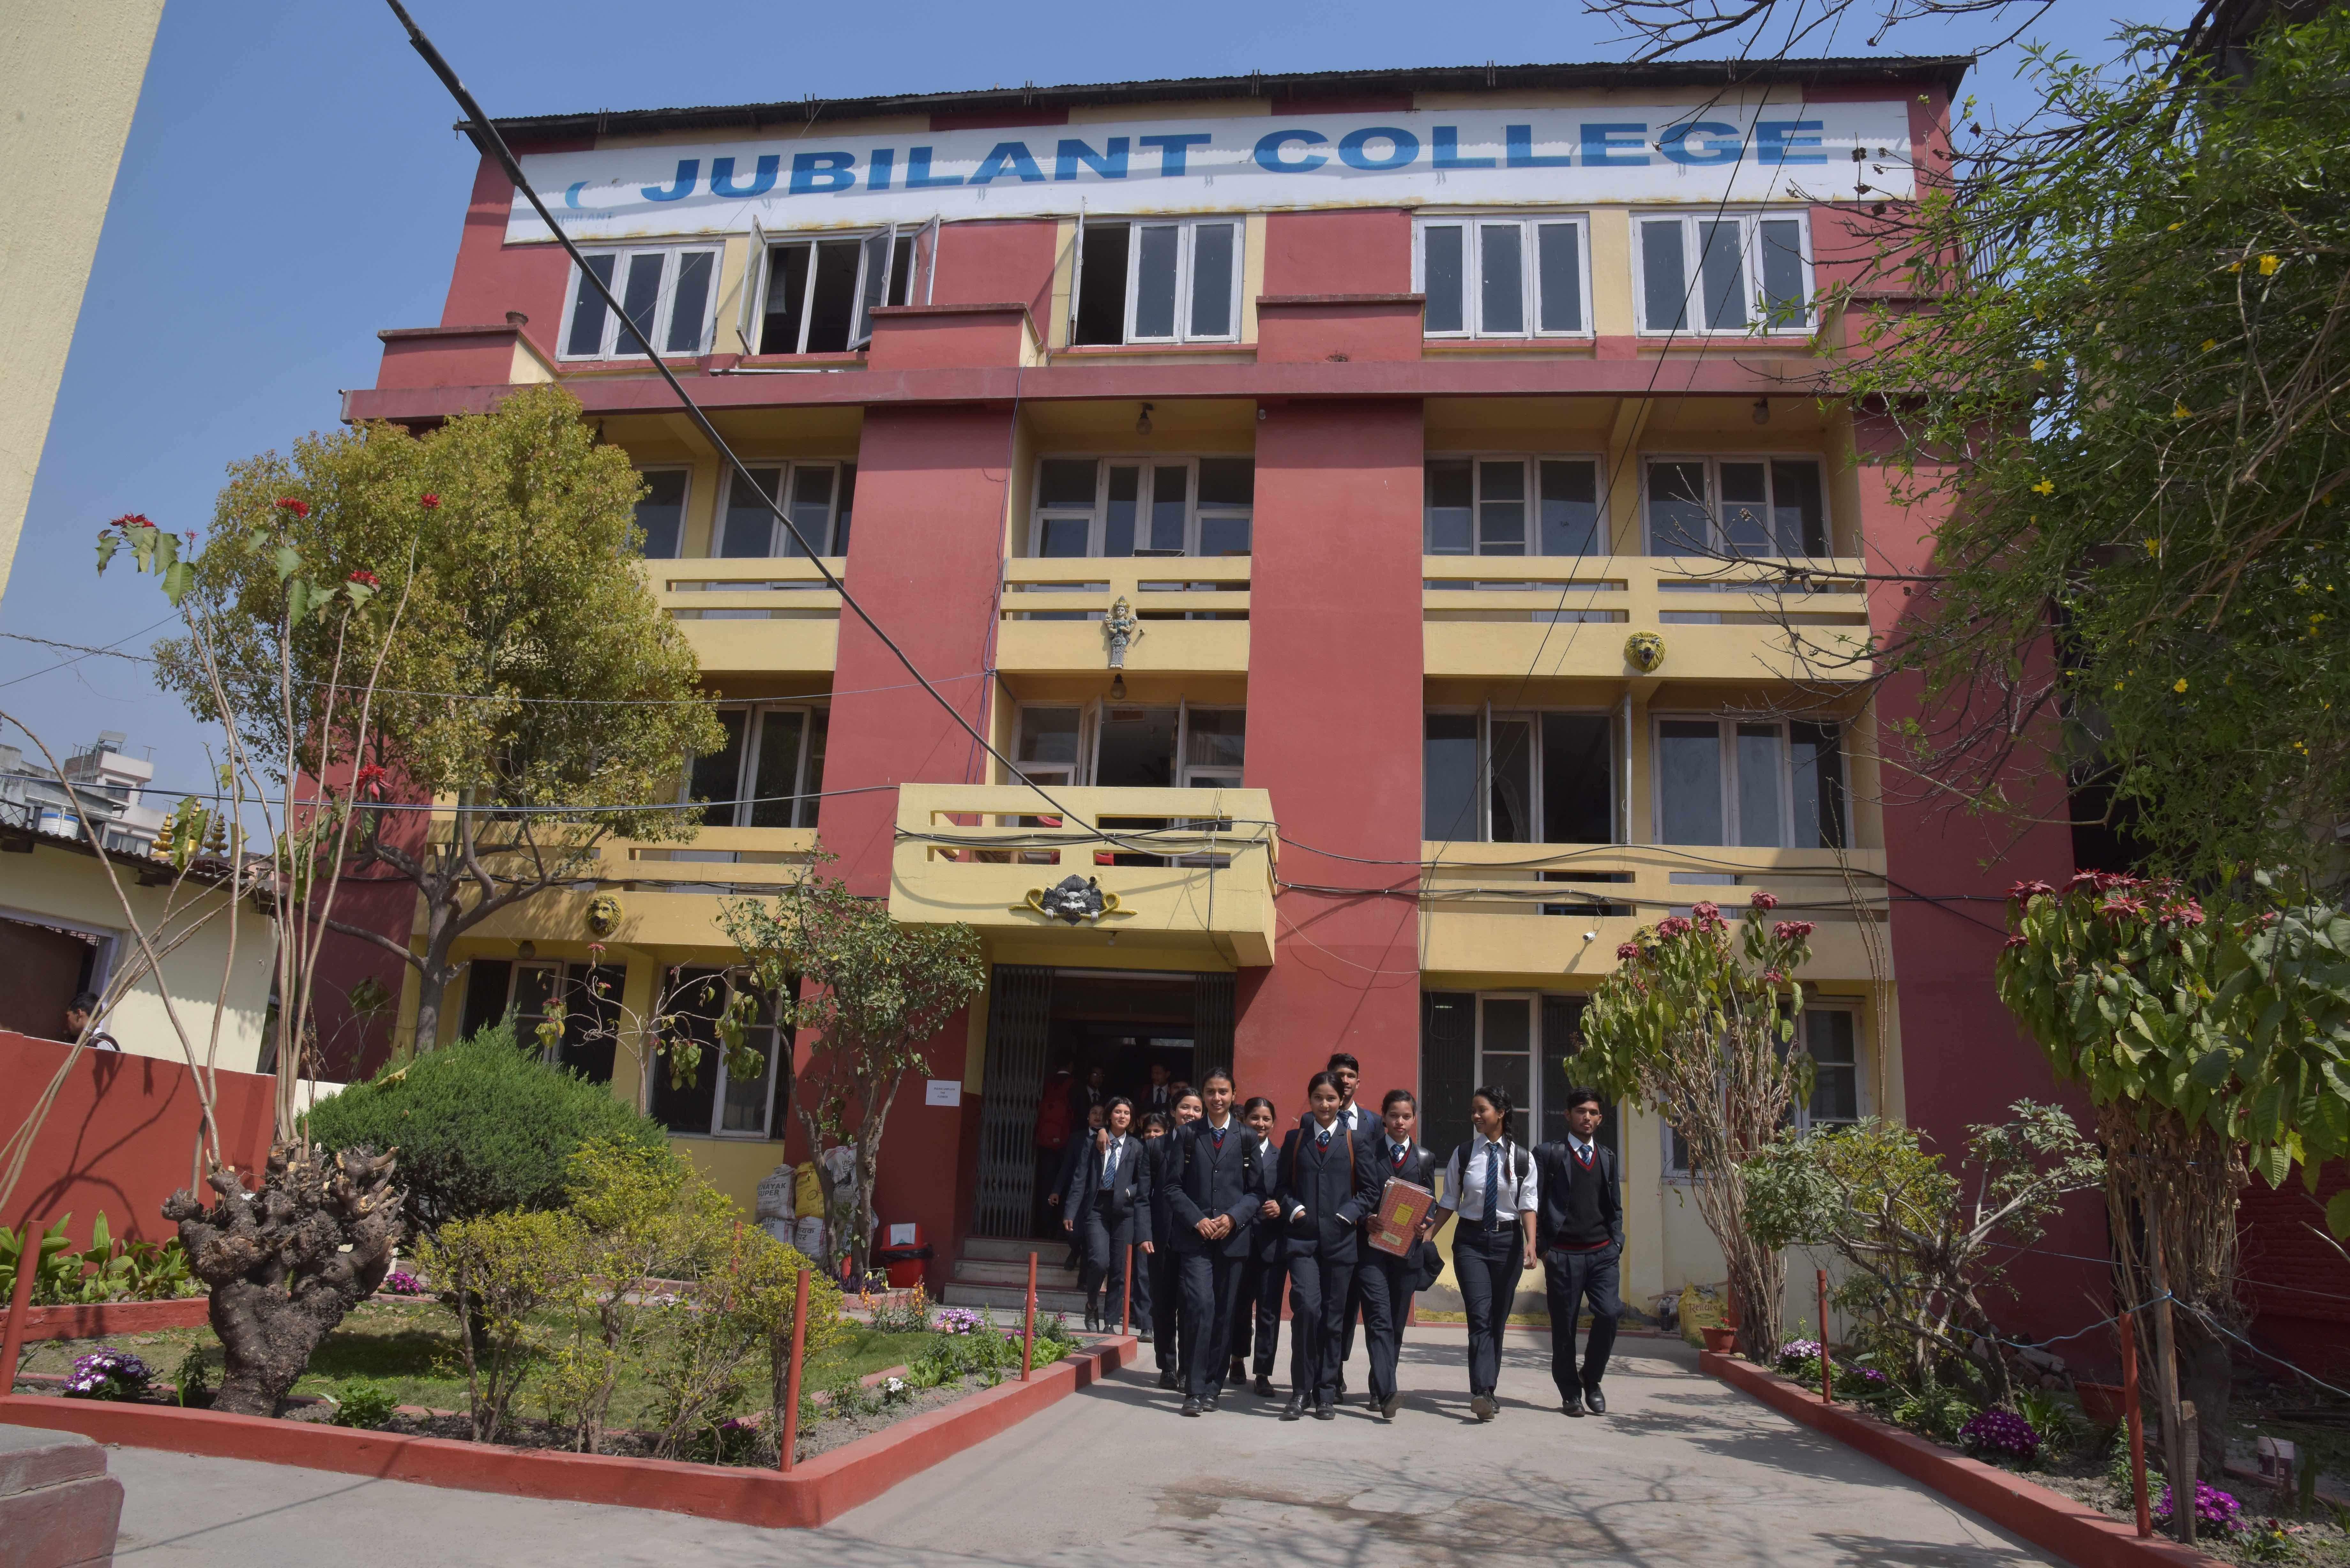 Jubilant College